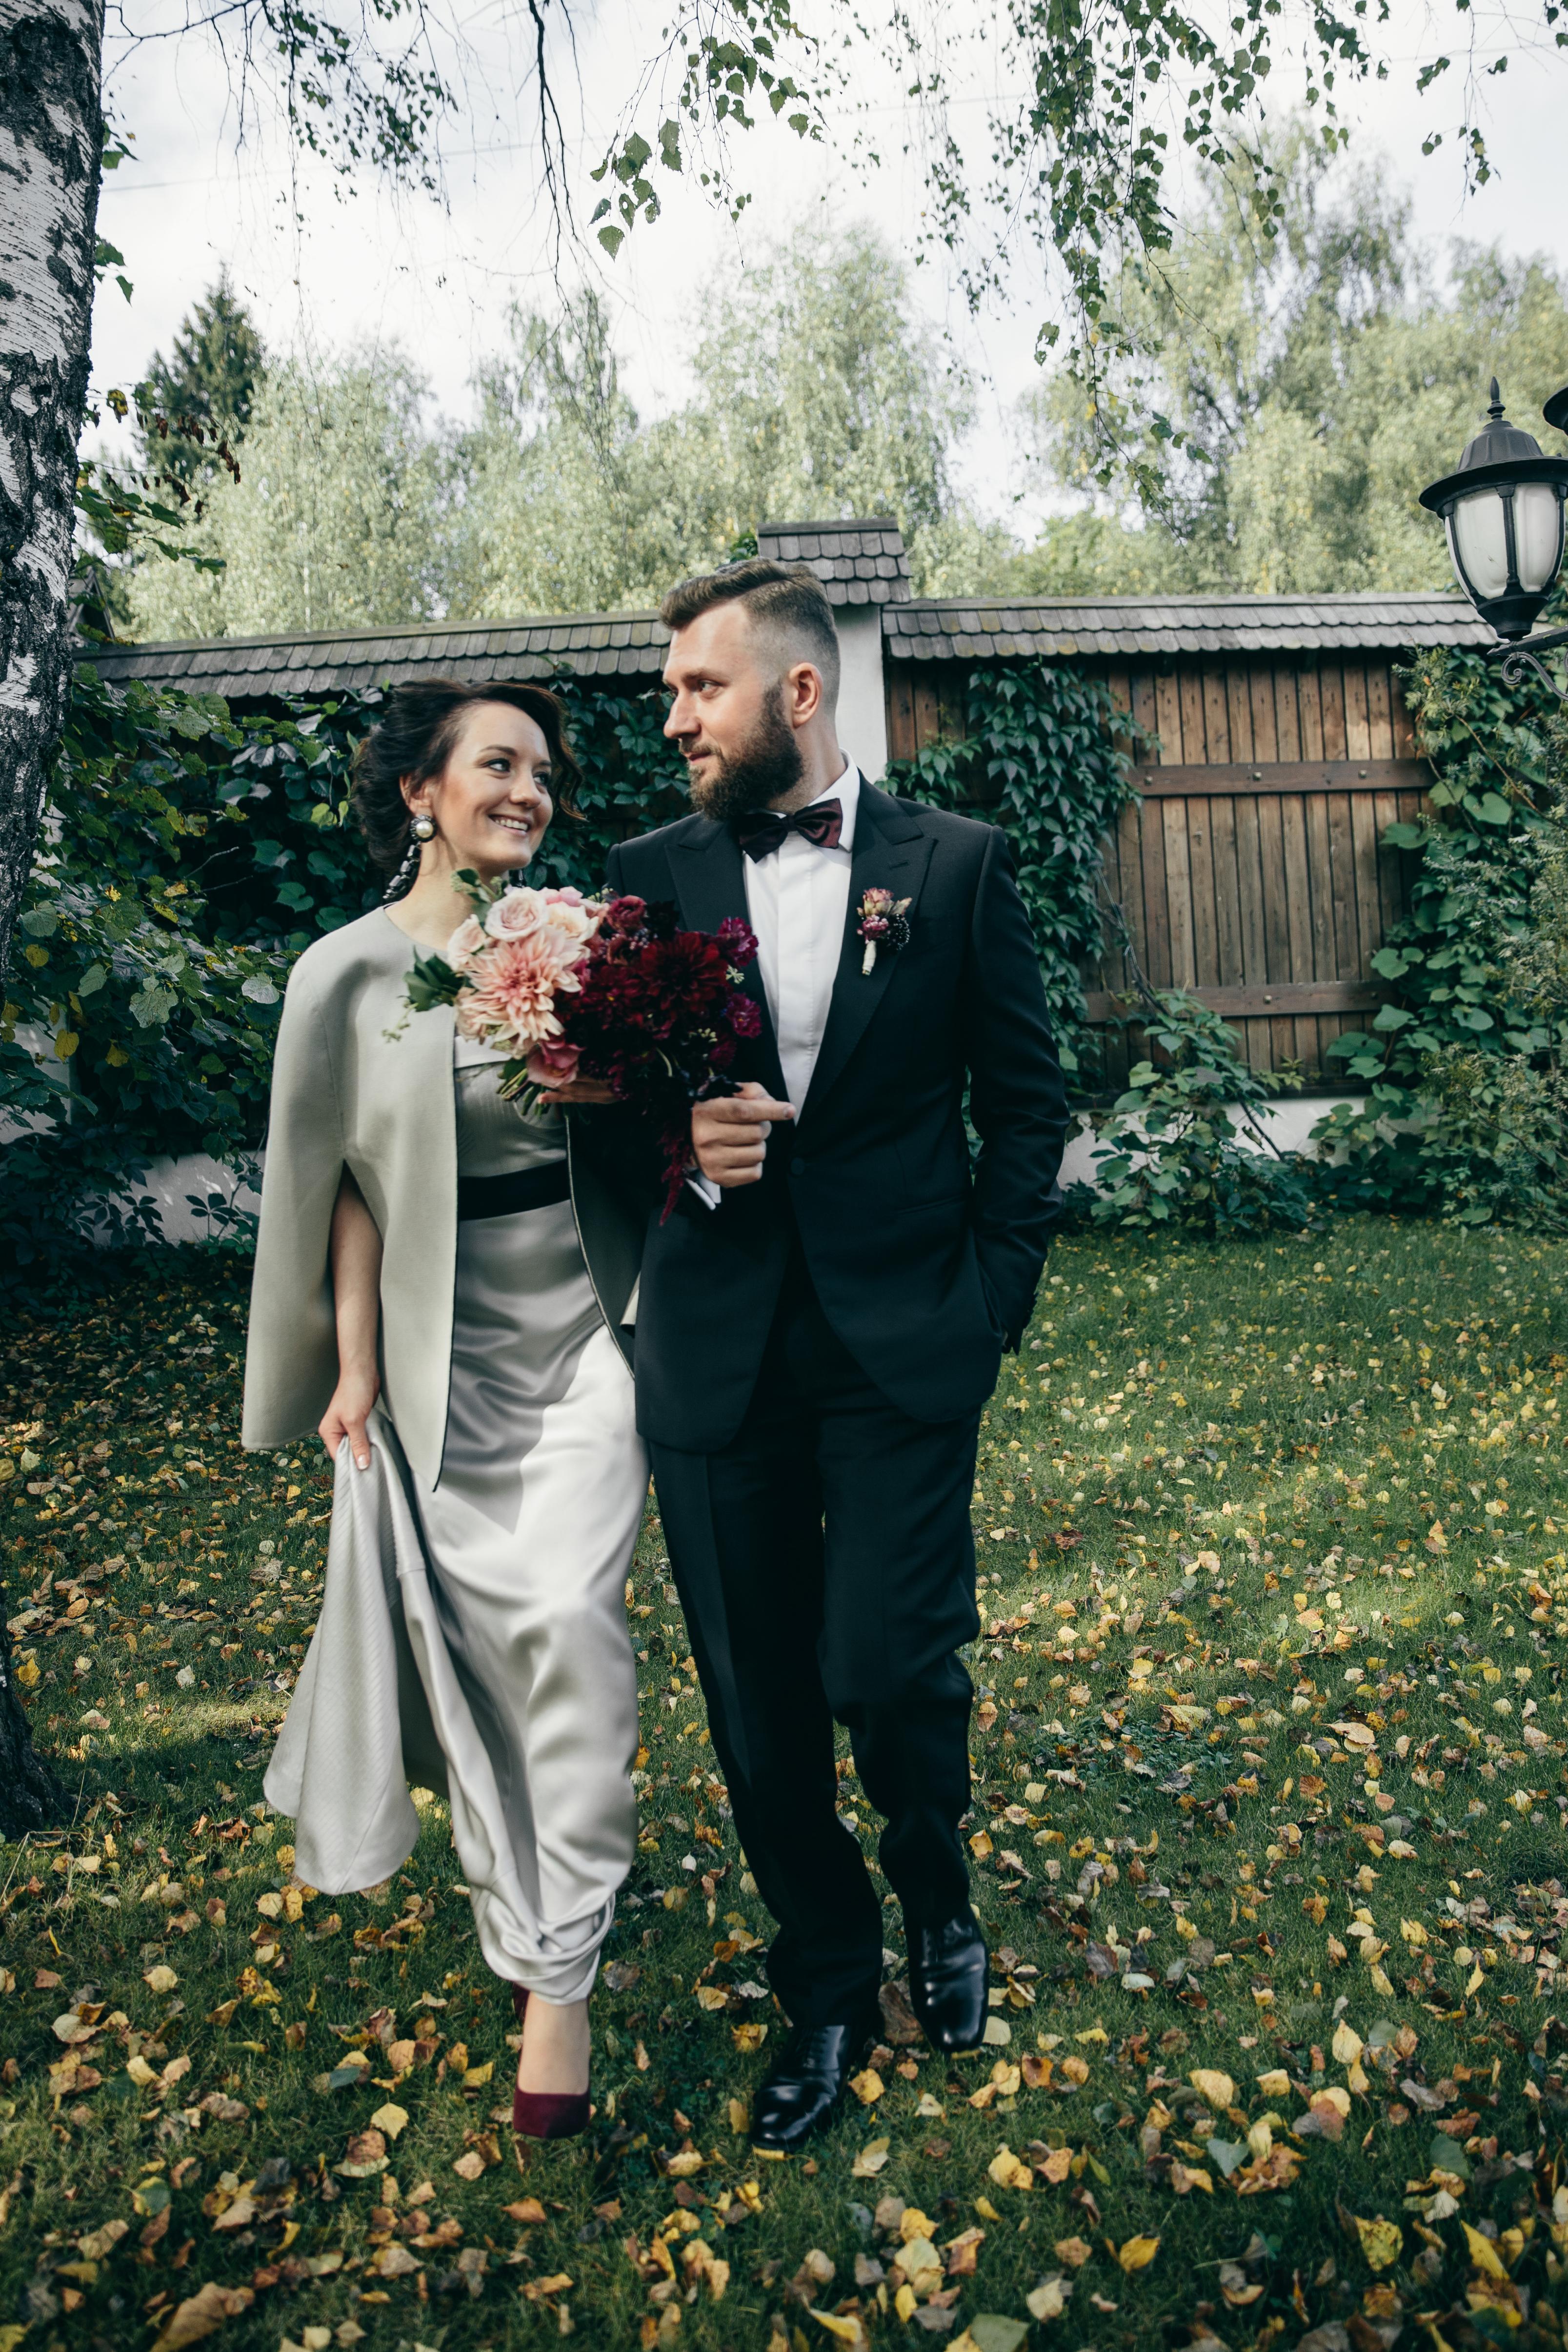 Свадьба осенью: тепло, душевно, вкусно